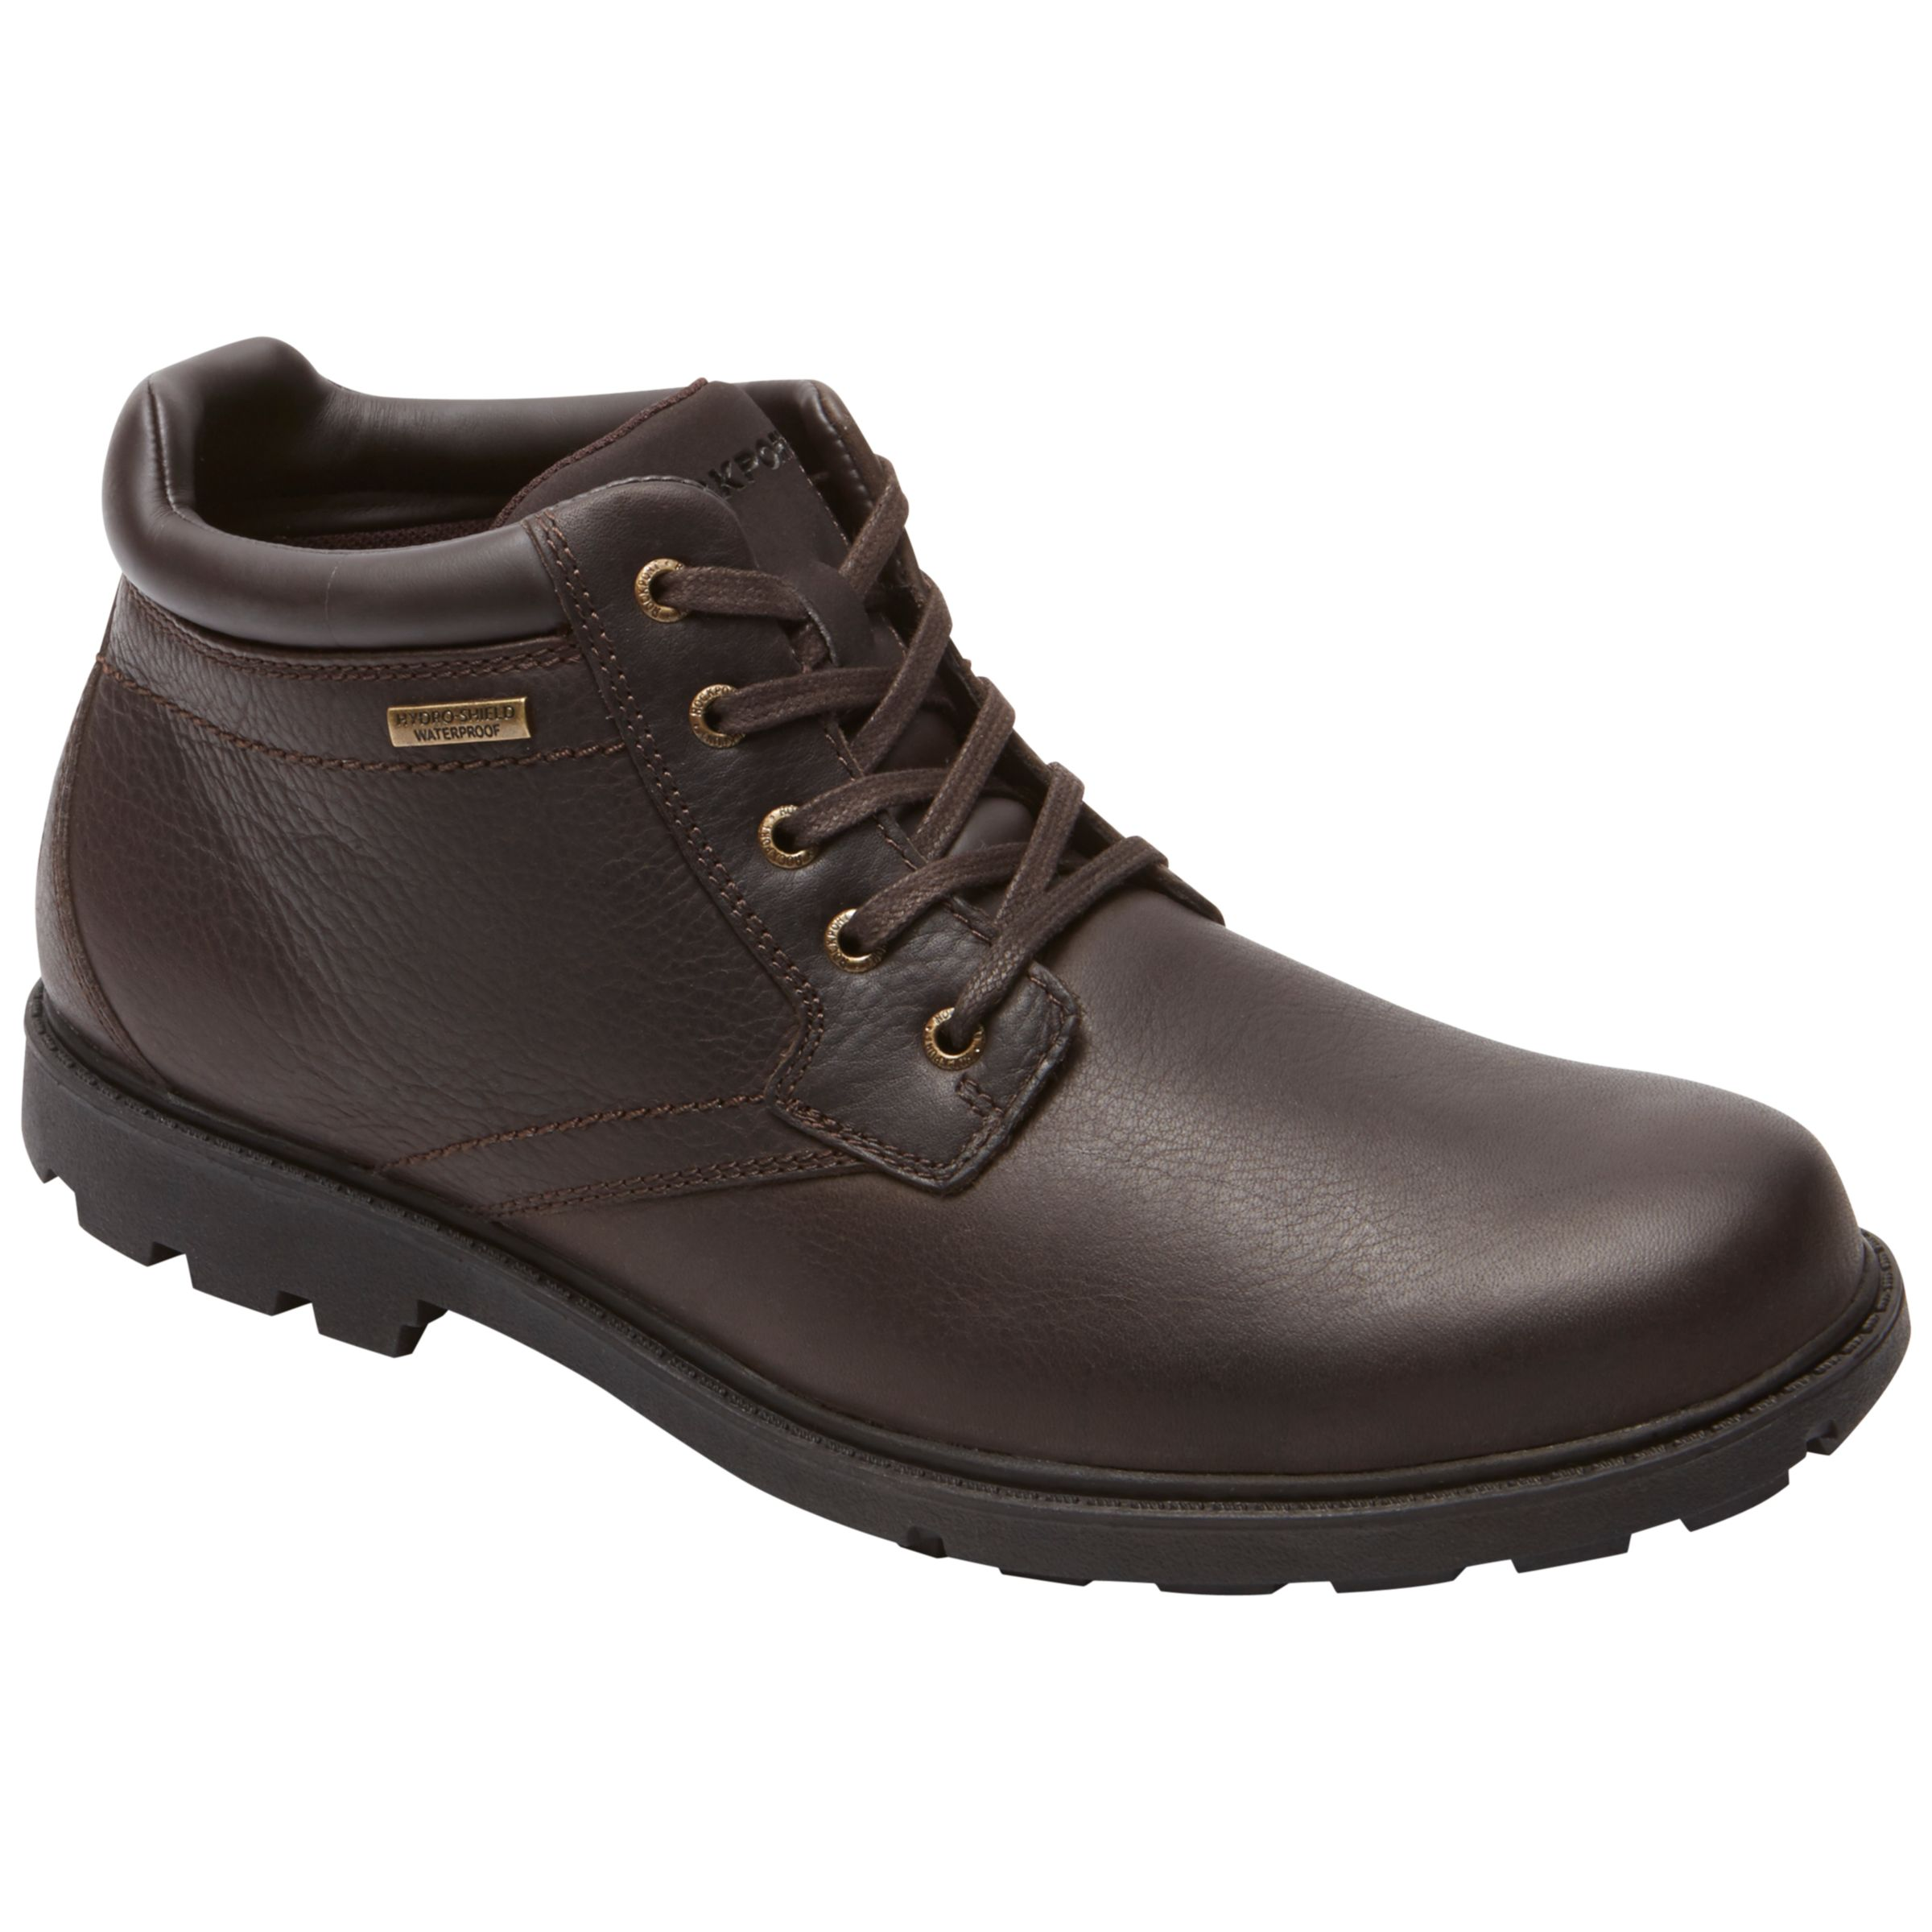 Rockport Rockport Rugged Bucks Plain Toe Leather Boots, Dark Brown